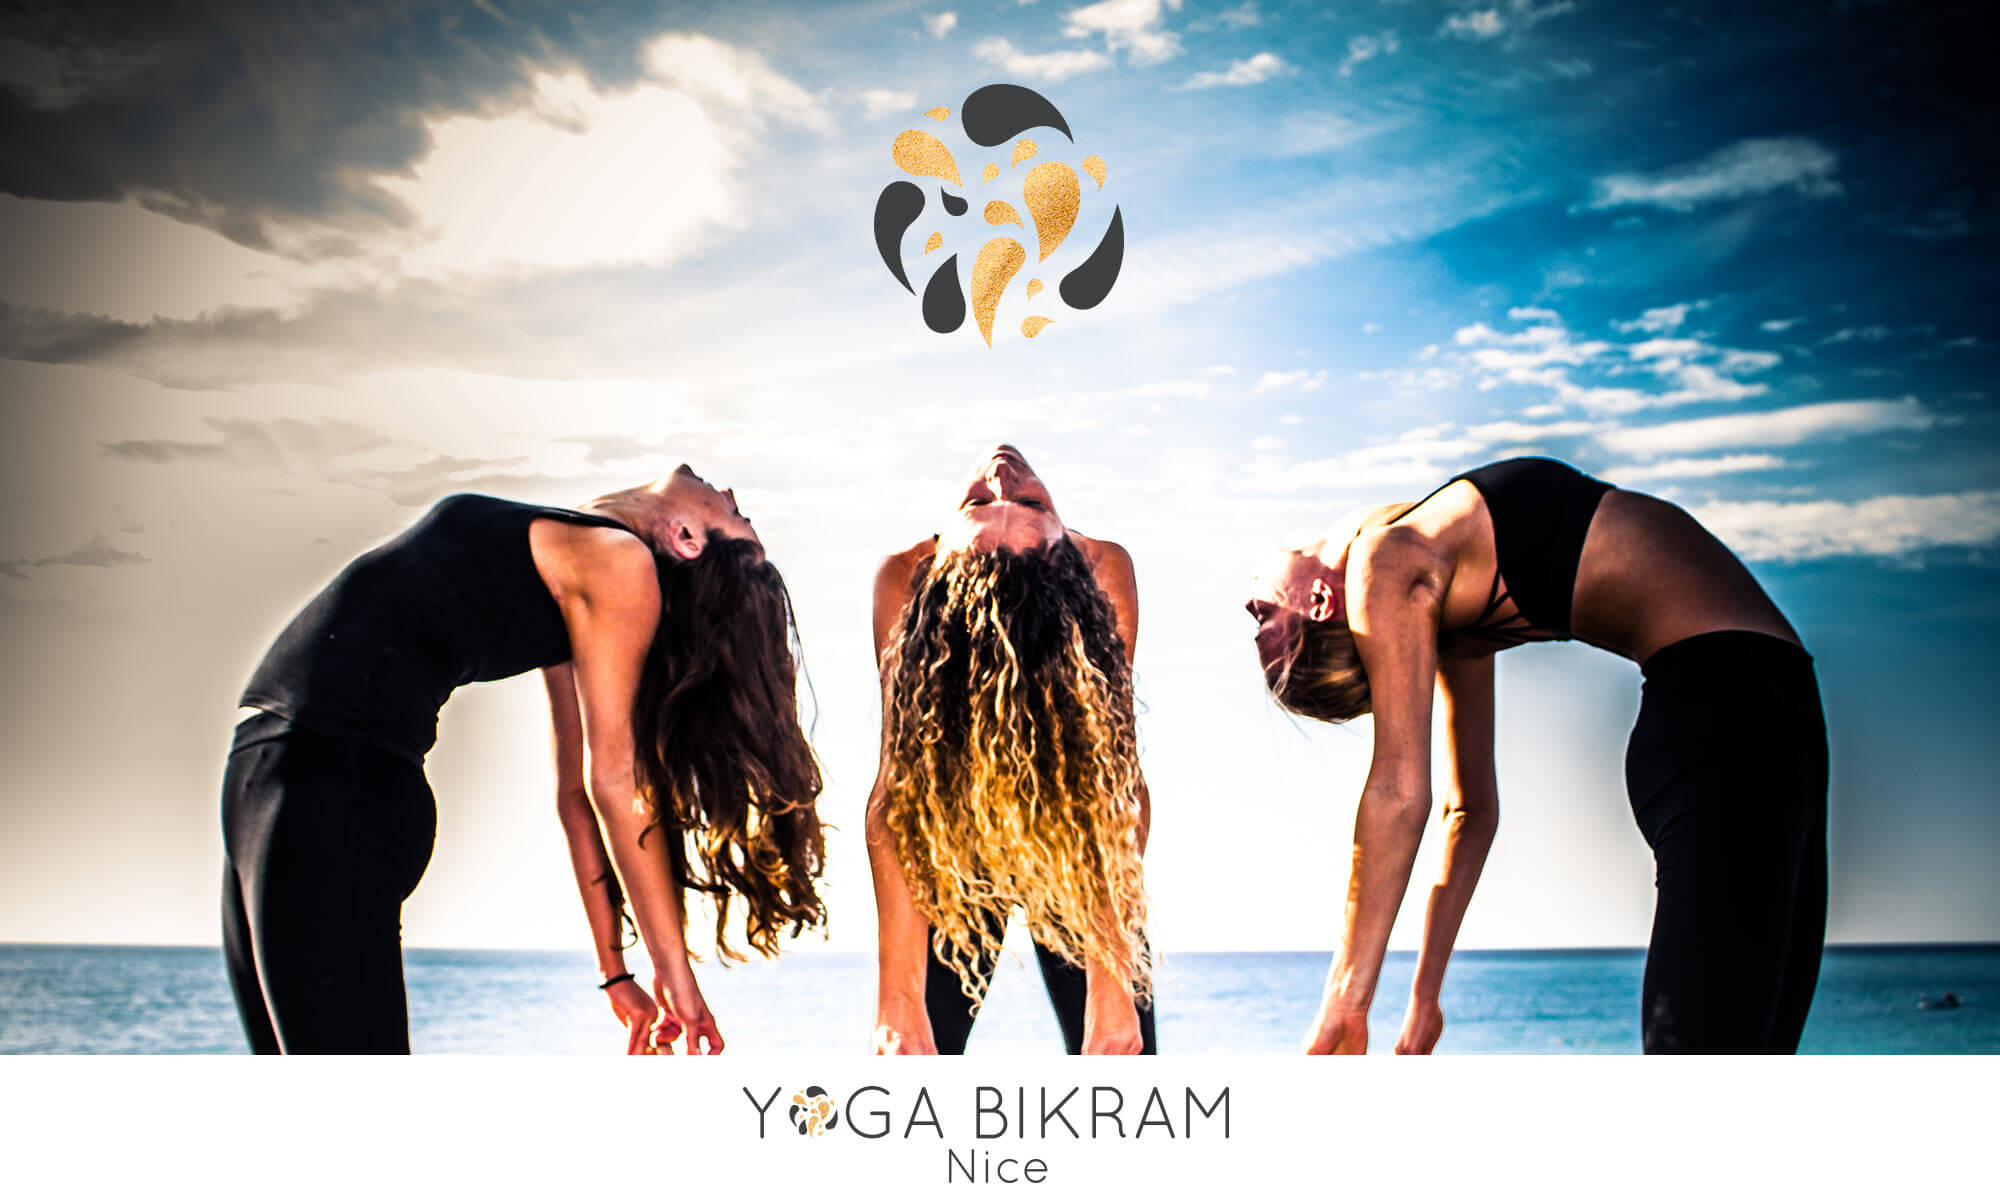 Yoga Bikram Nice